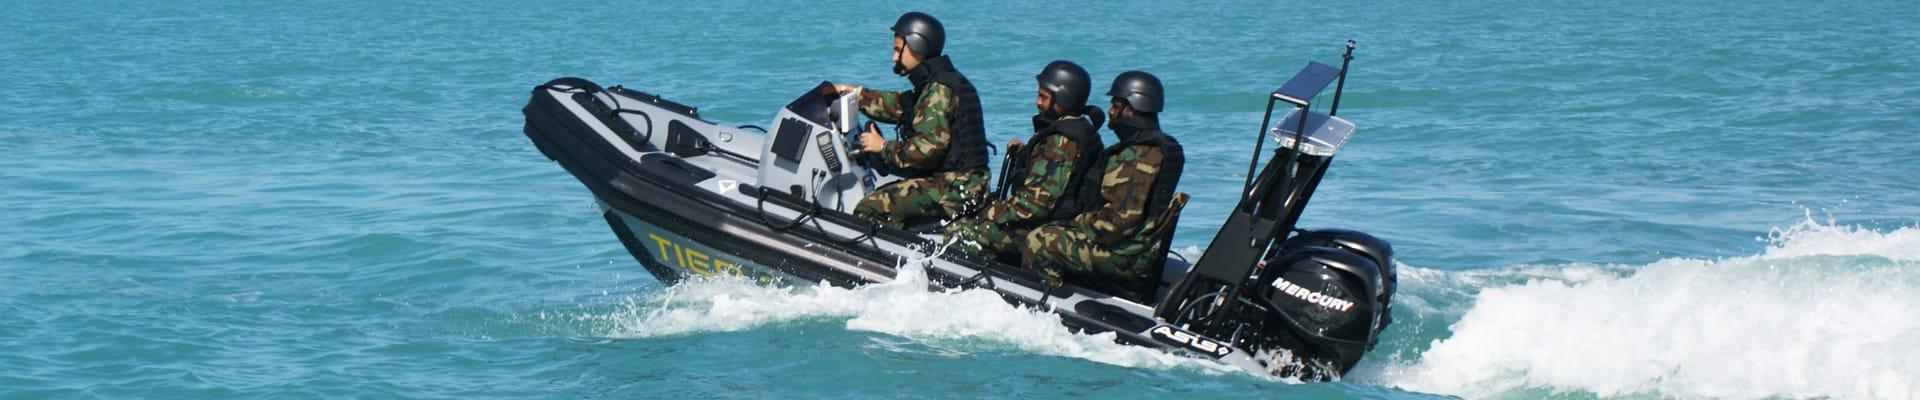 asis-antipiracy-boats-4.1-meter